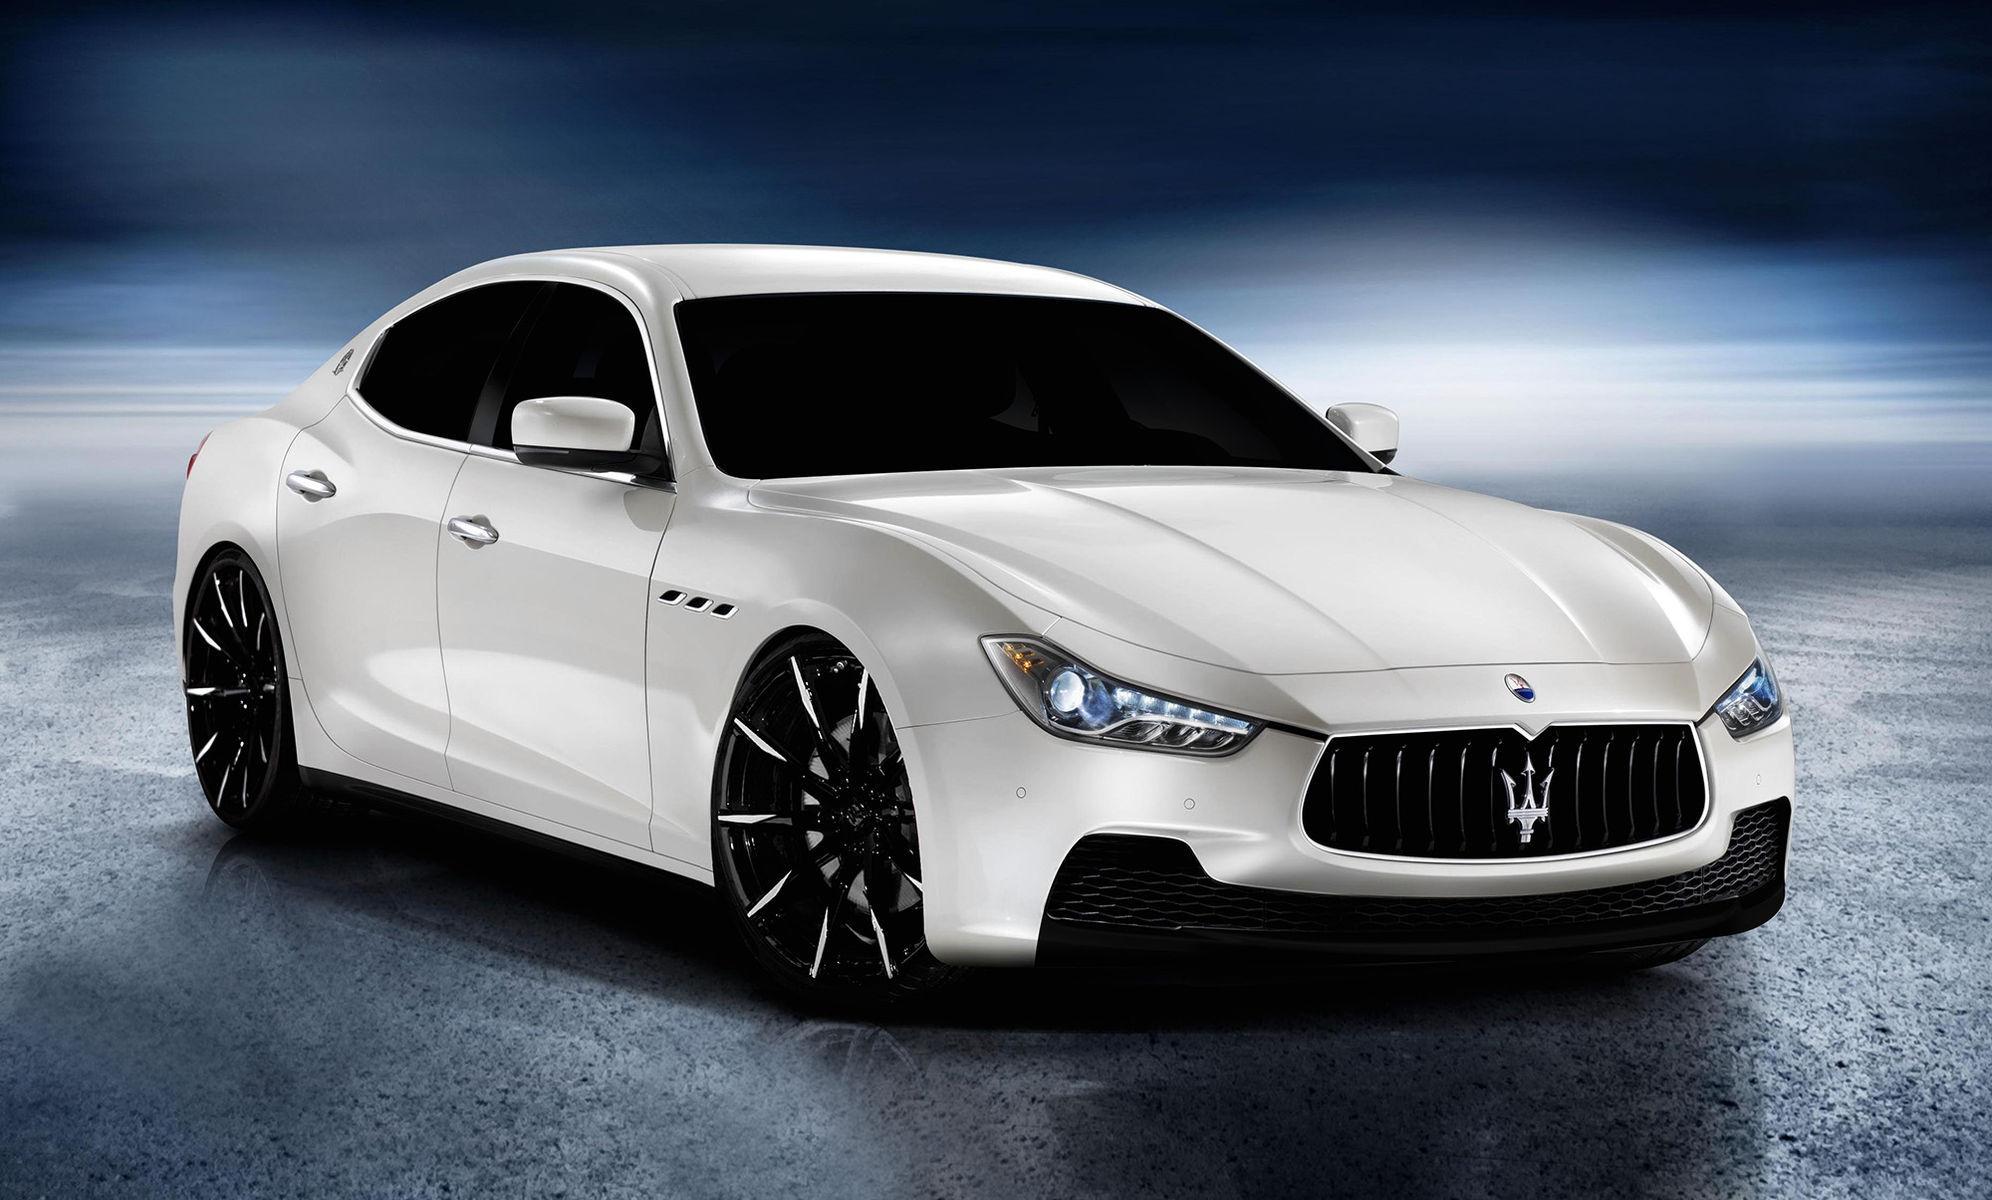 2014 Maserati Quattroporte | Maserati Ghibli on Lexani CSS-15's